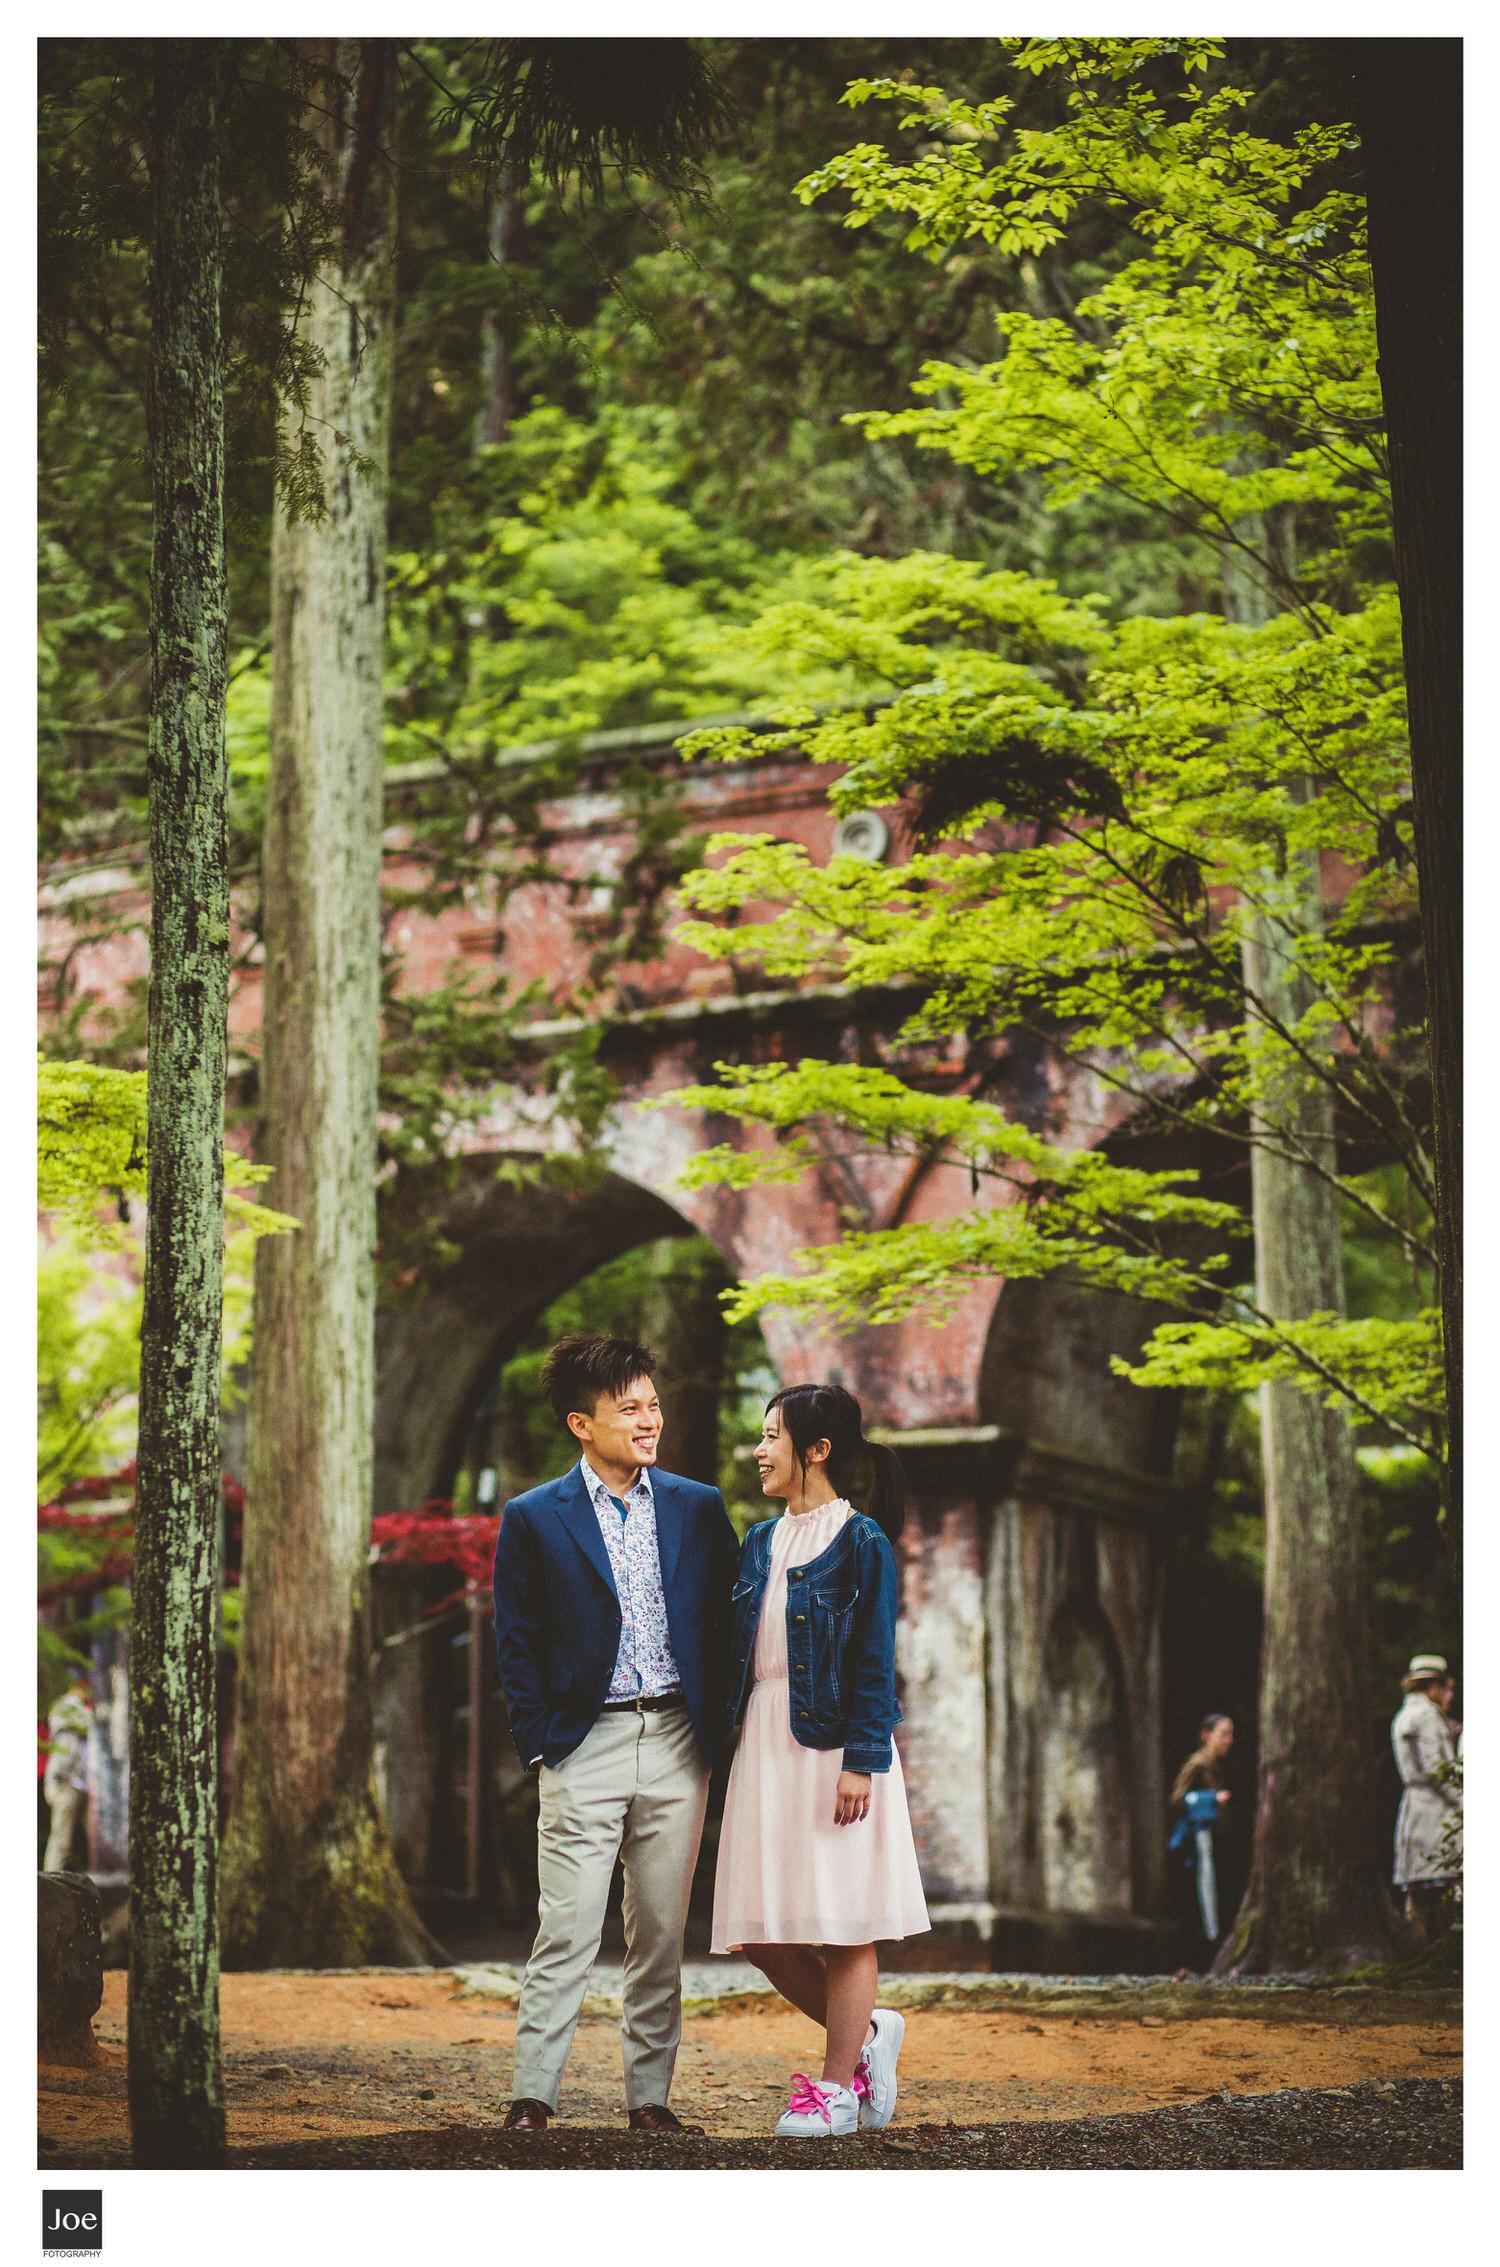 26-nanzenji-temple-kyoto-pre-wedding-angela-danny-joe-fotography.jpg